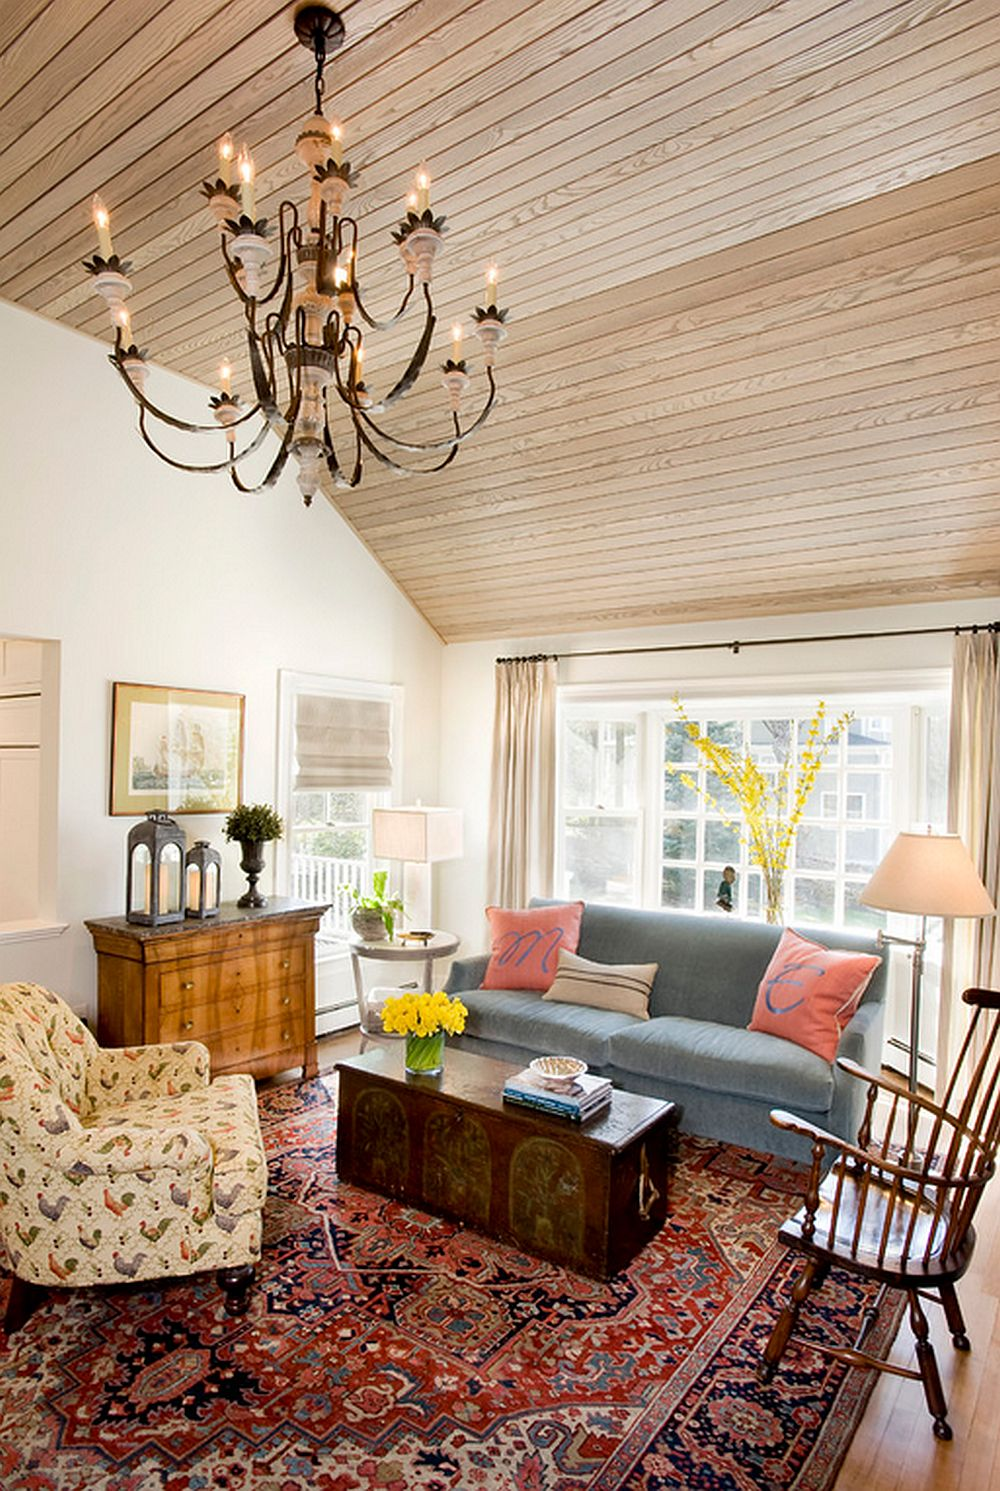 adelaparvu.com despre casa rustica in culori pastel, designer Karen Tager (3)